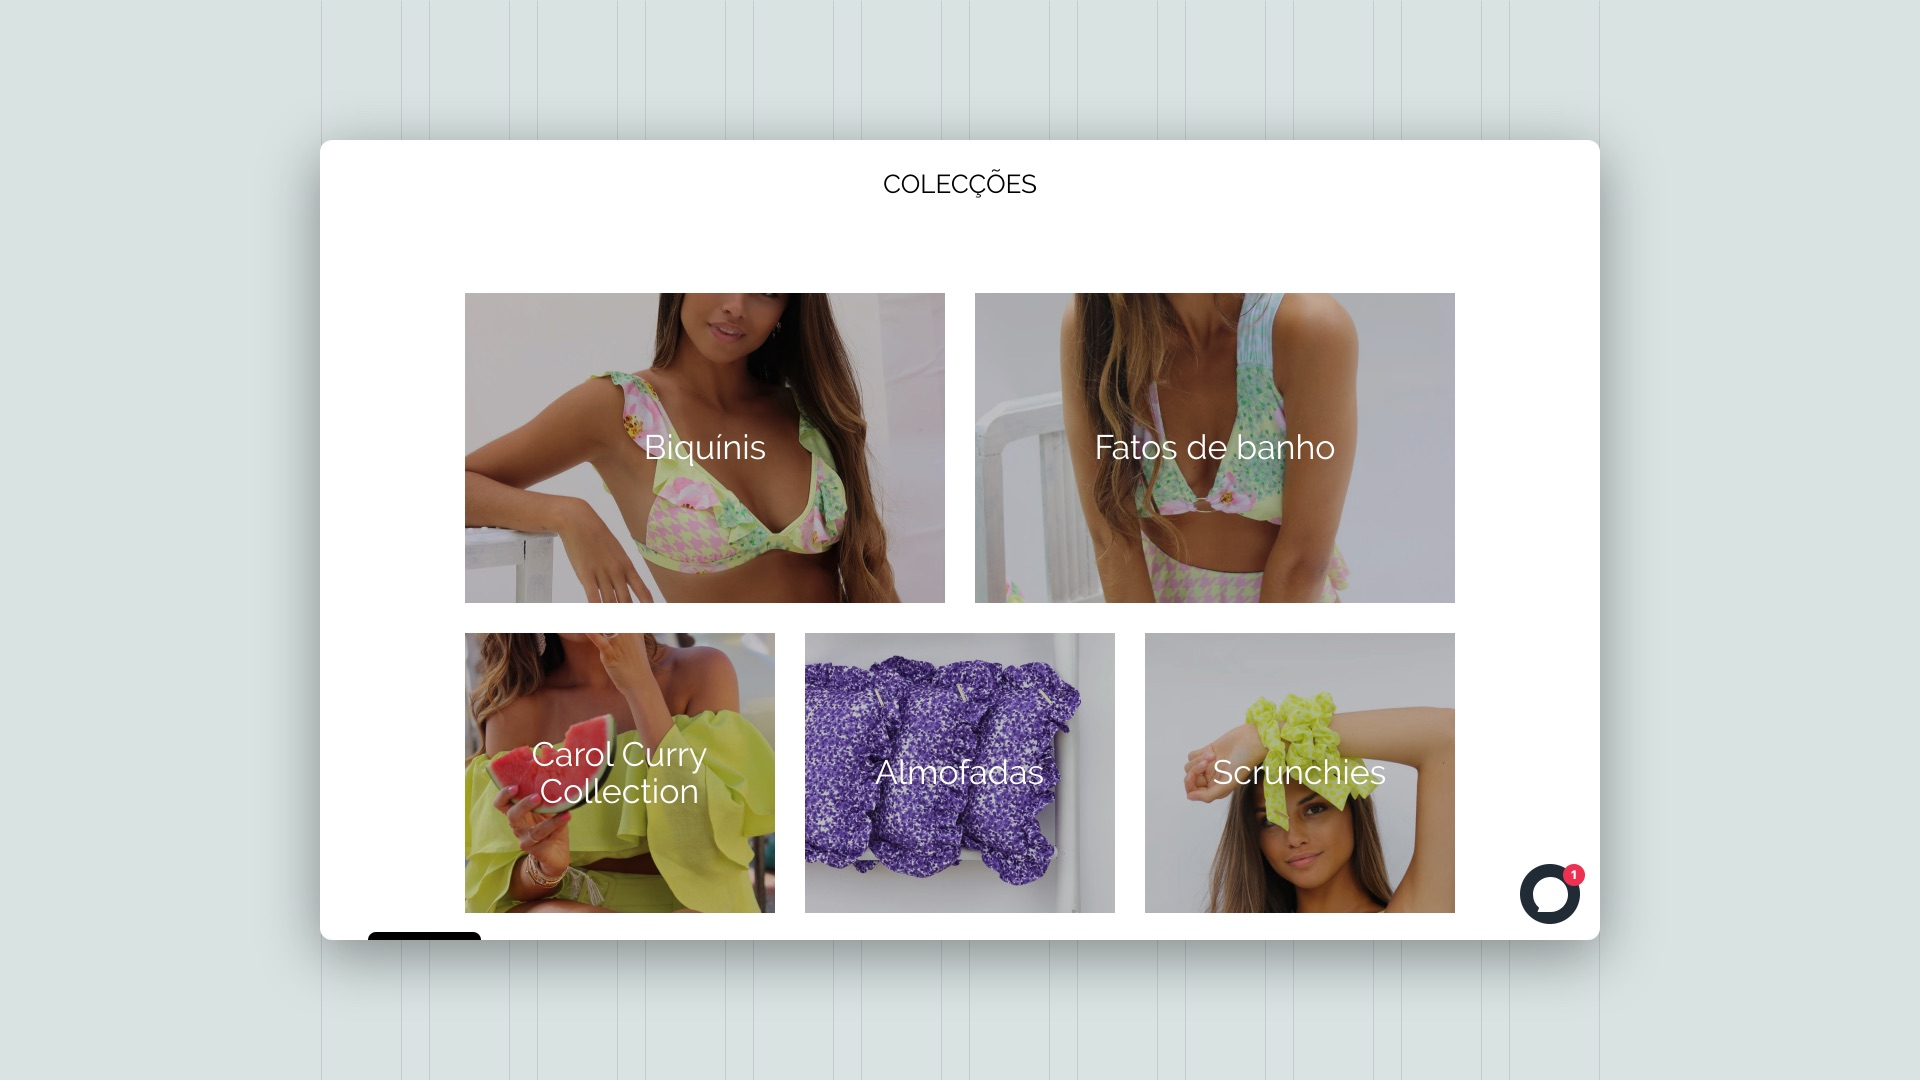 Frambooesas online store